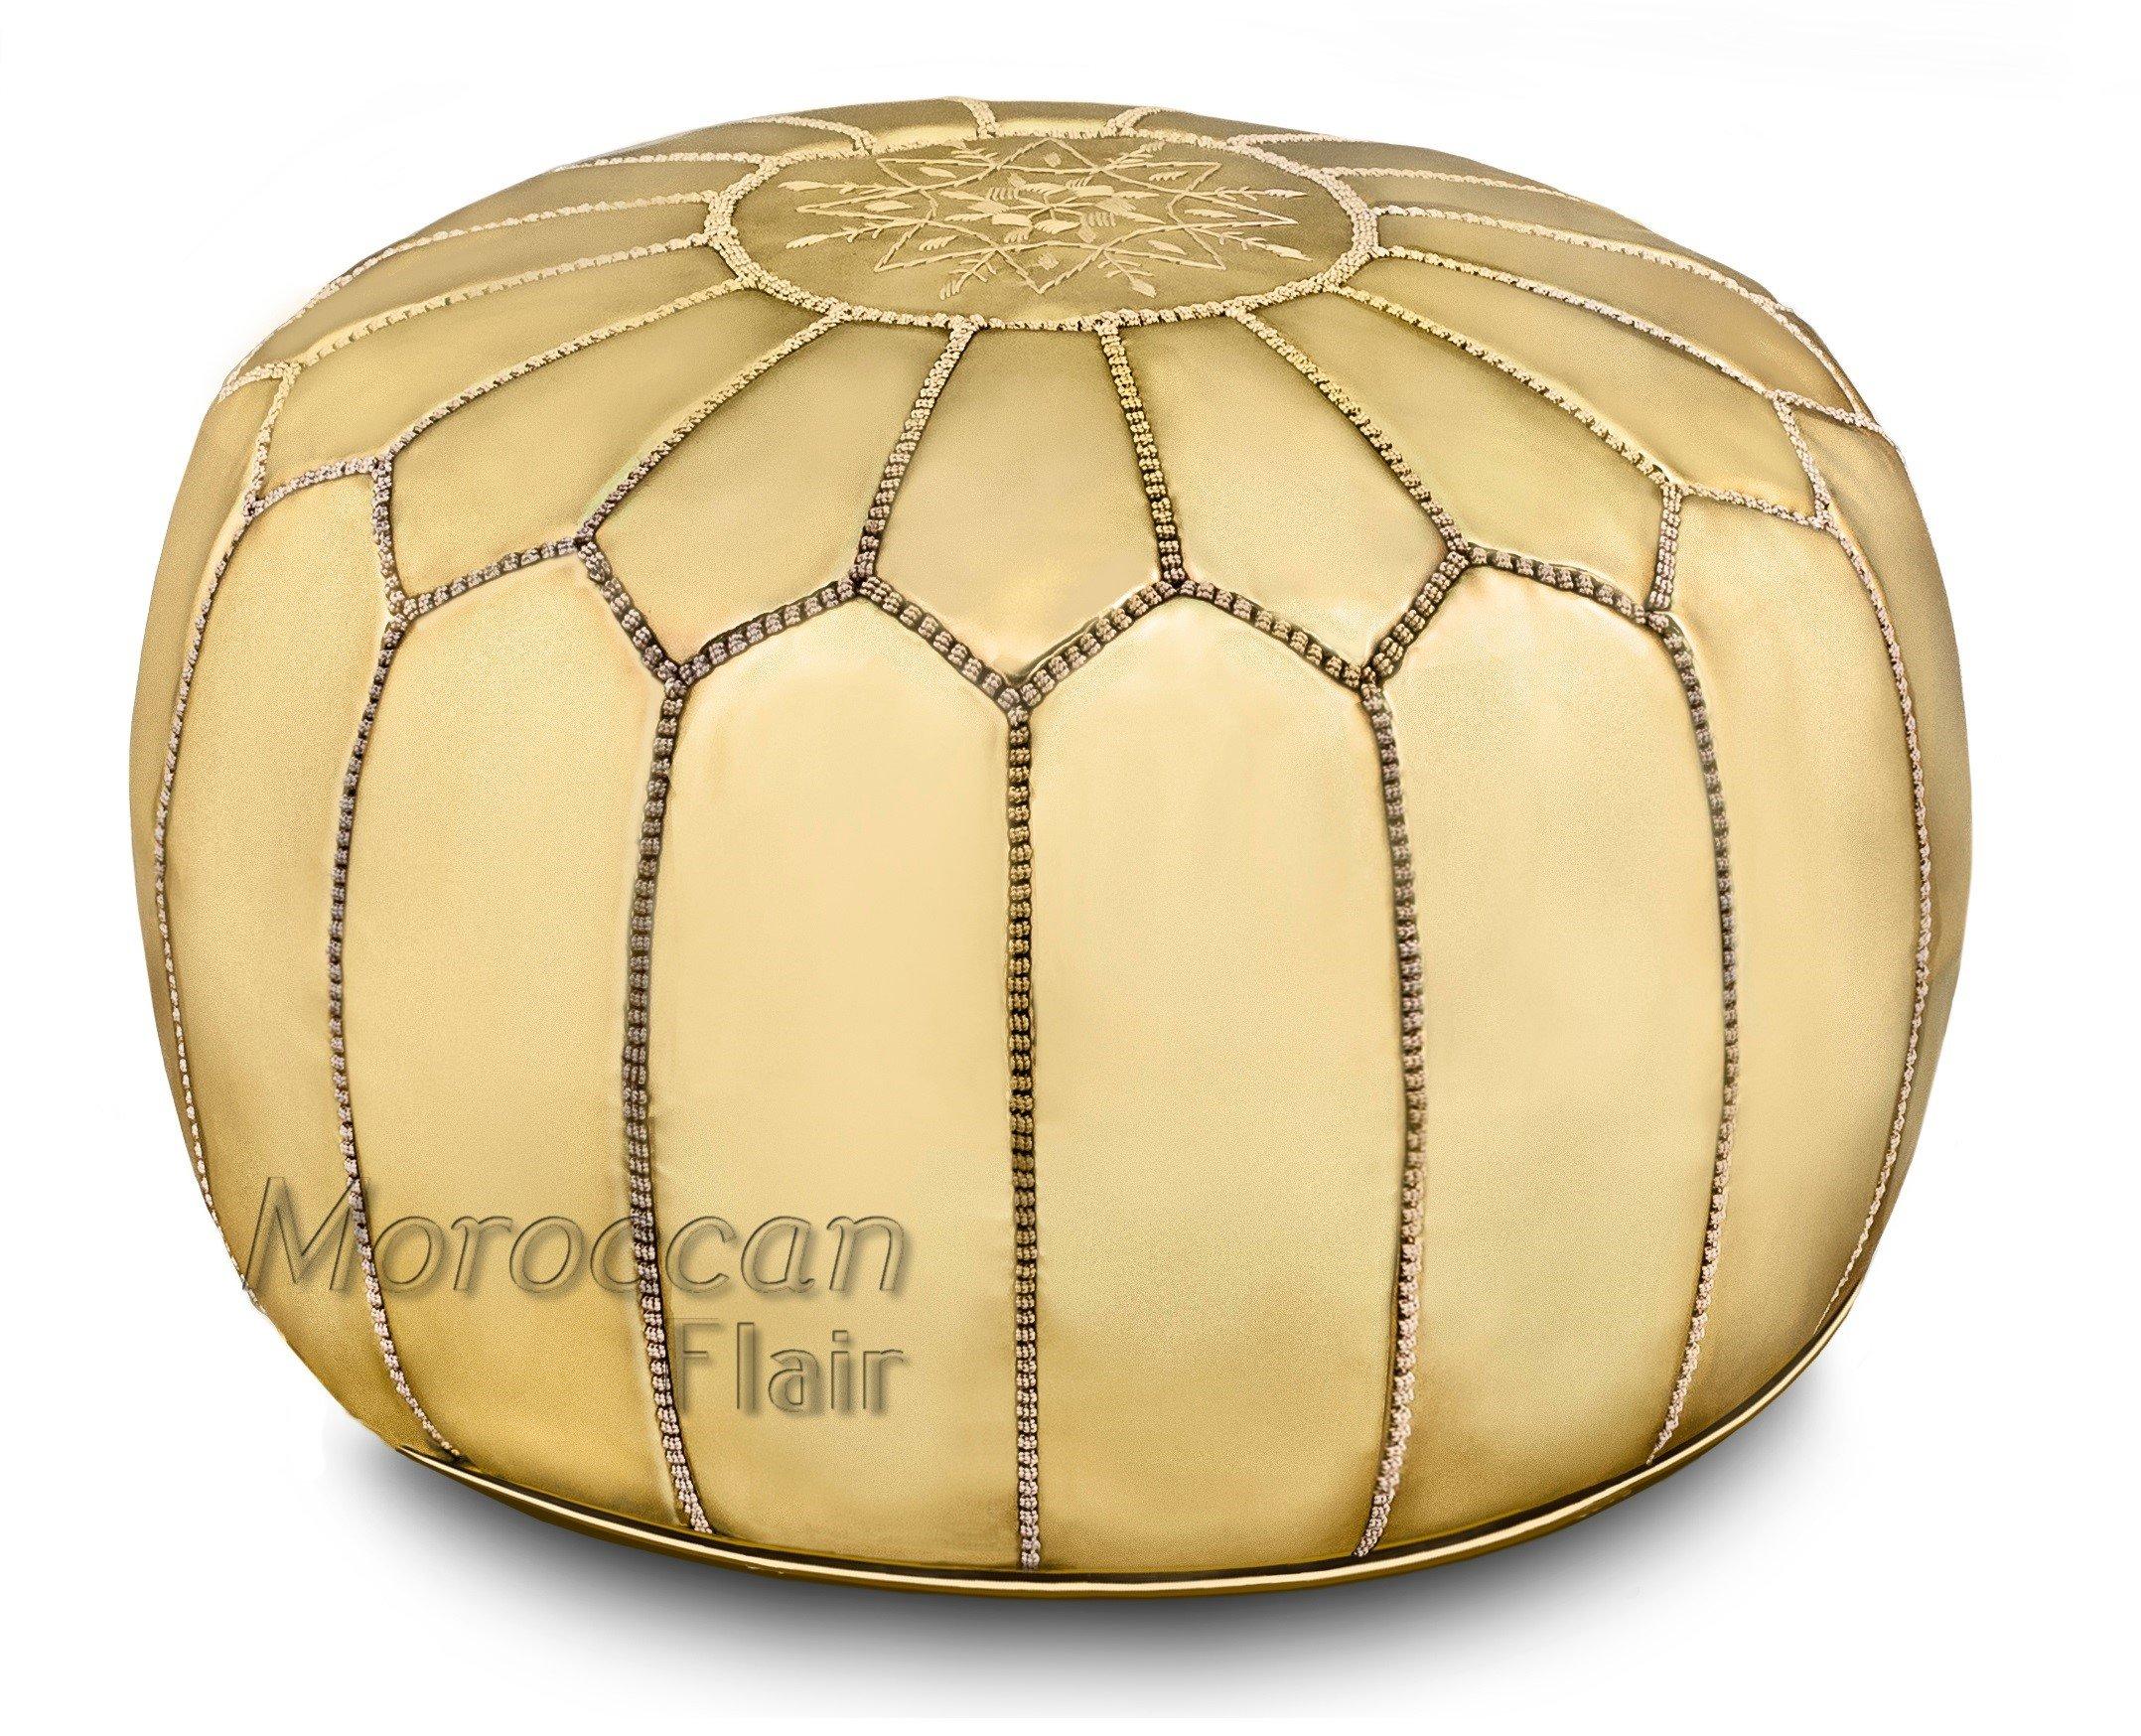 Stuffed Handmade Metallic Leather Moroccan Pouf, Ottoman (Gold Metallic)